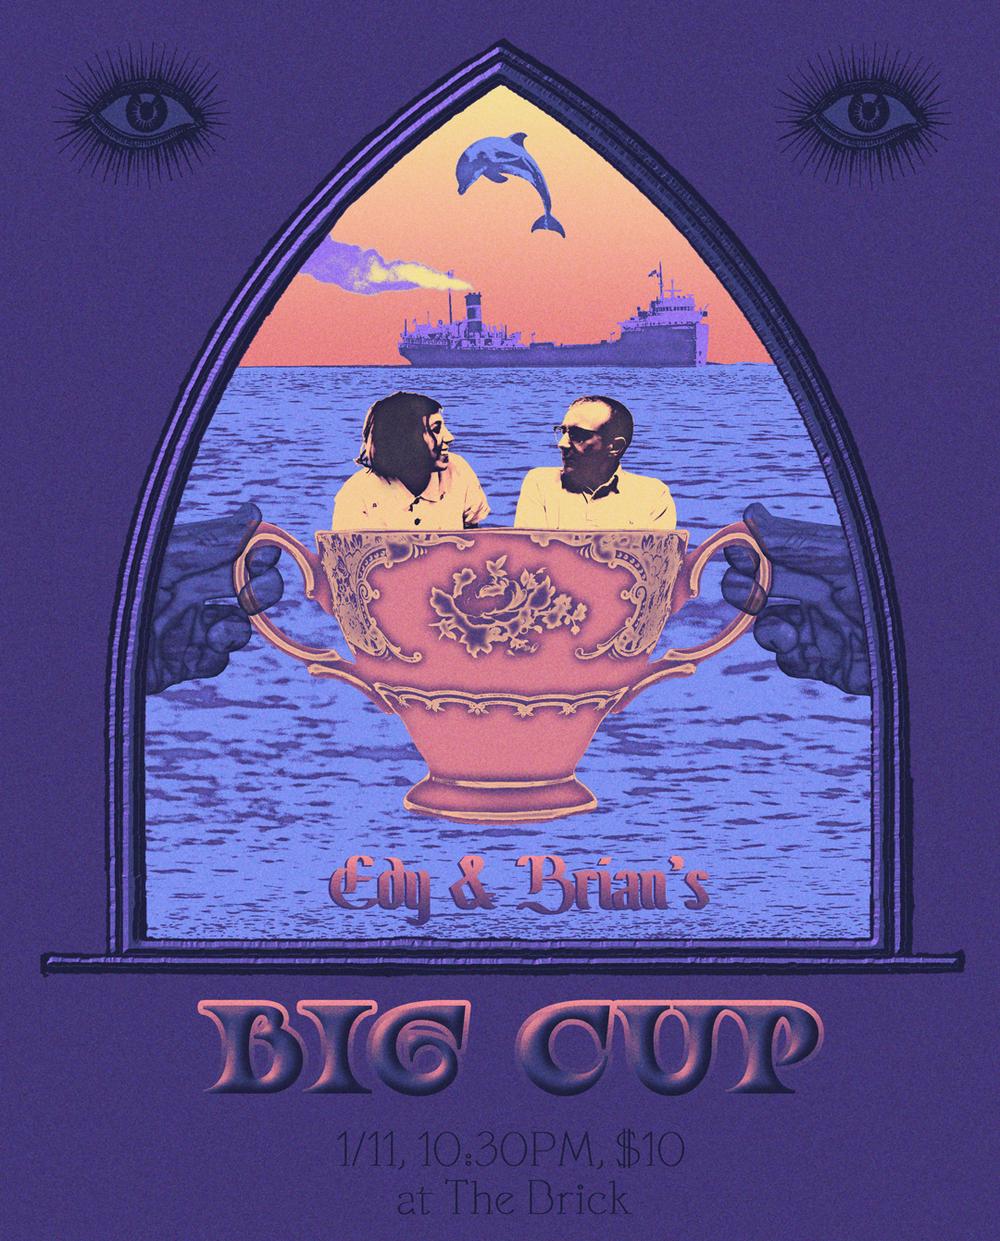 Big-Cup (1).png